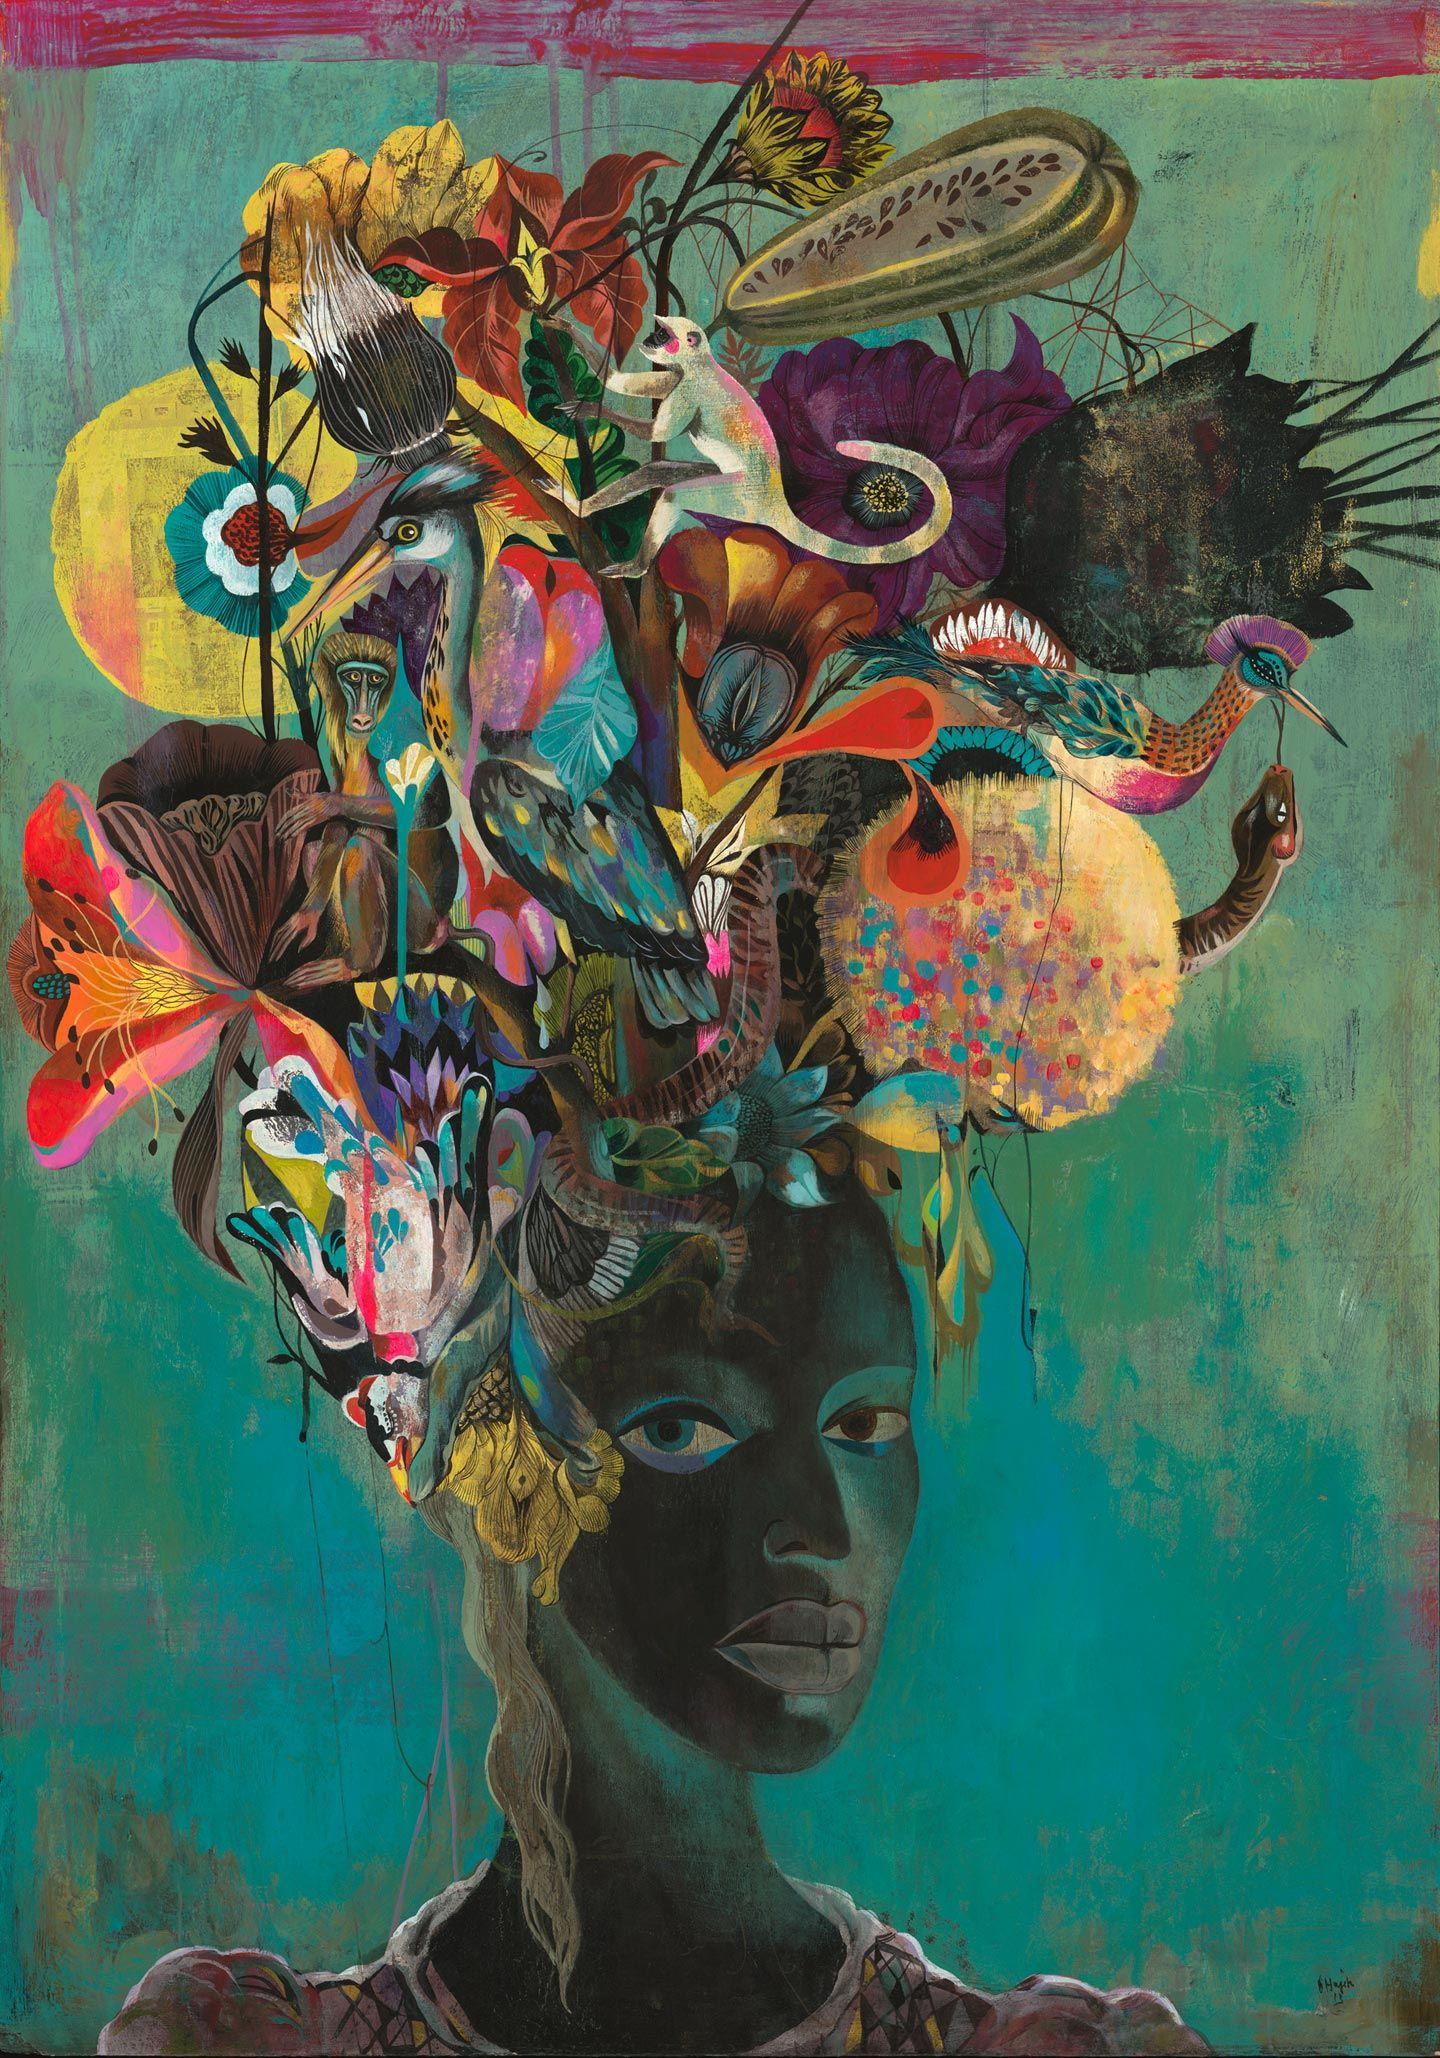 Black Paradise Ii Olaf Hajek Dope Art. In 2019